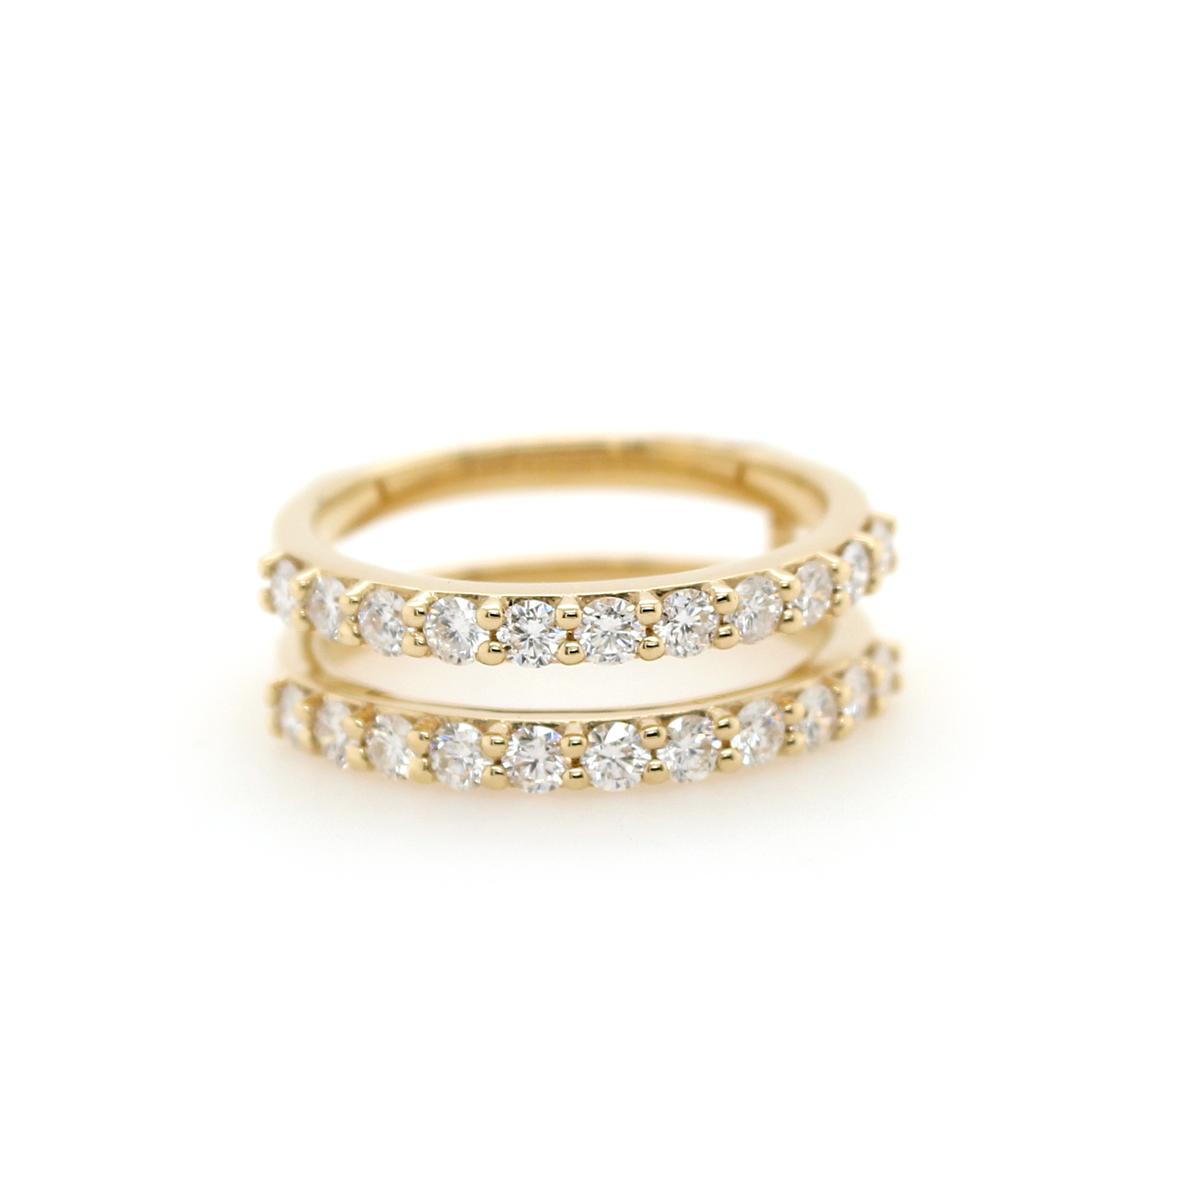 Shefi Diamonds 14 Karat Yellow Gold 1 Carat Diamond Ring Jacket